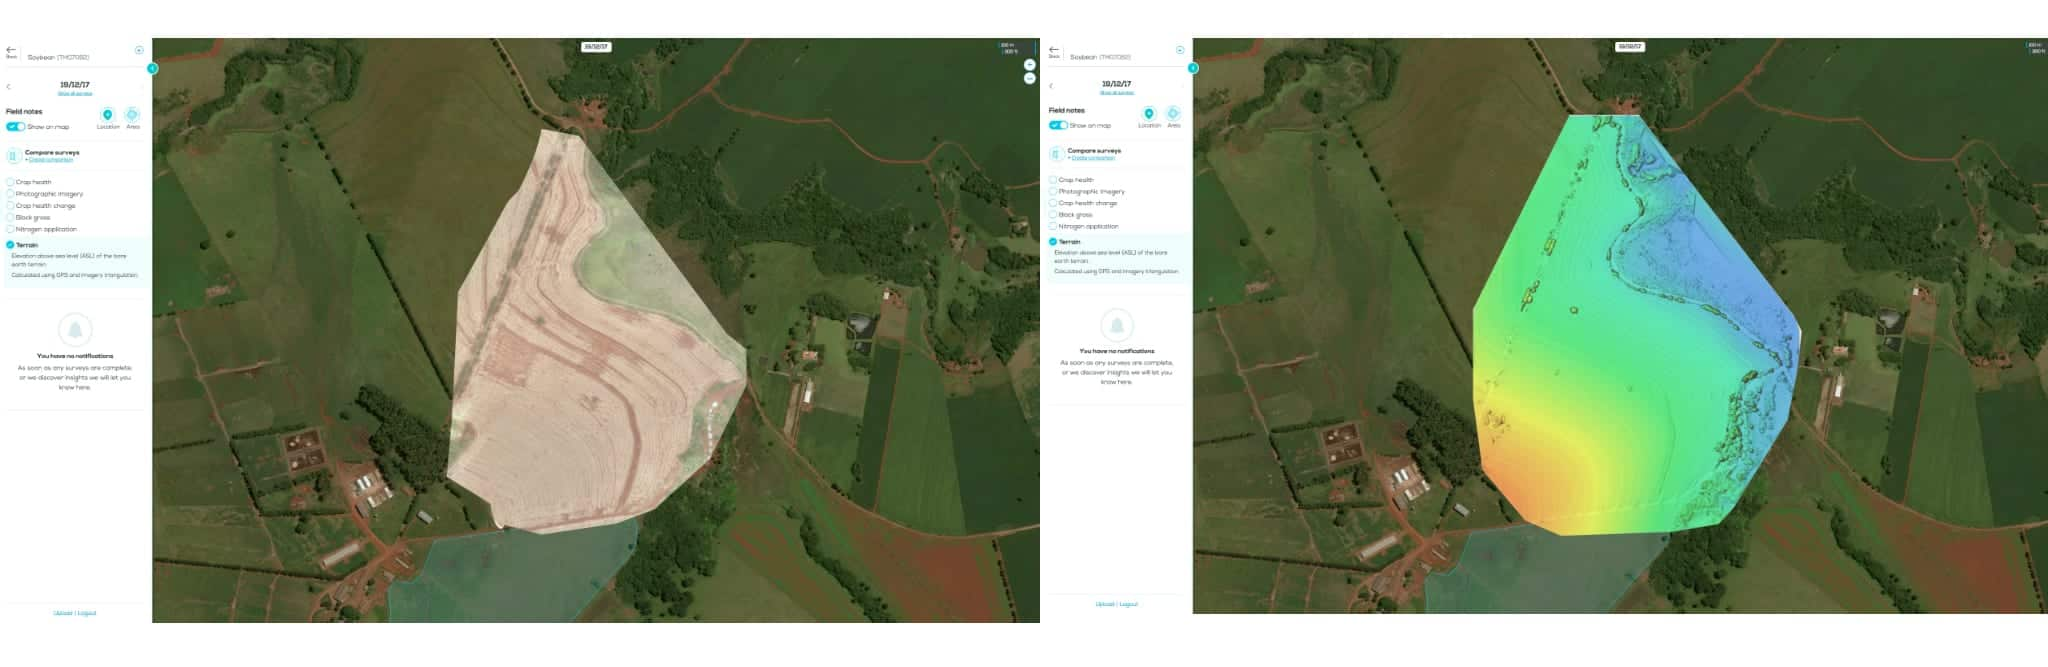 Pix4Dengine - UAV Photogrammetry Data Processing